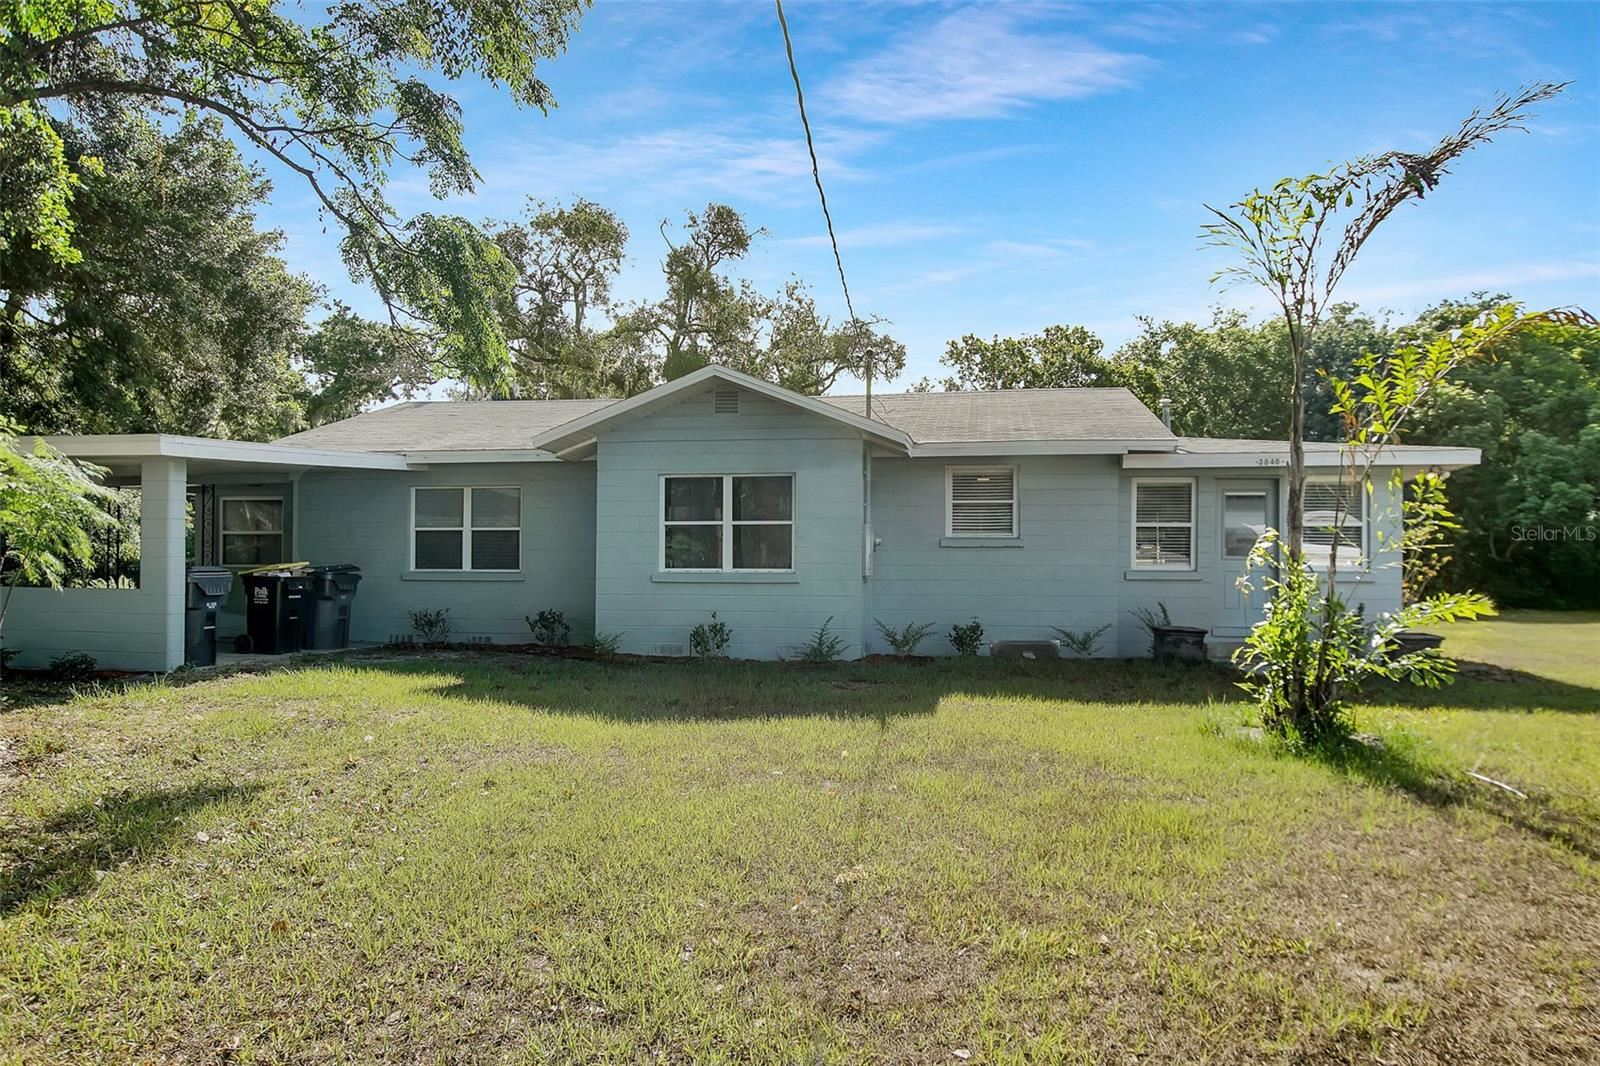 3040 STEWART STREET, Lakeland, FL 33803 - #: P4915974